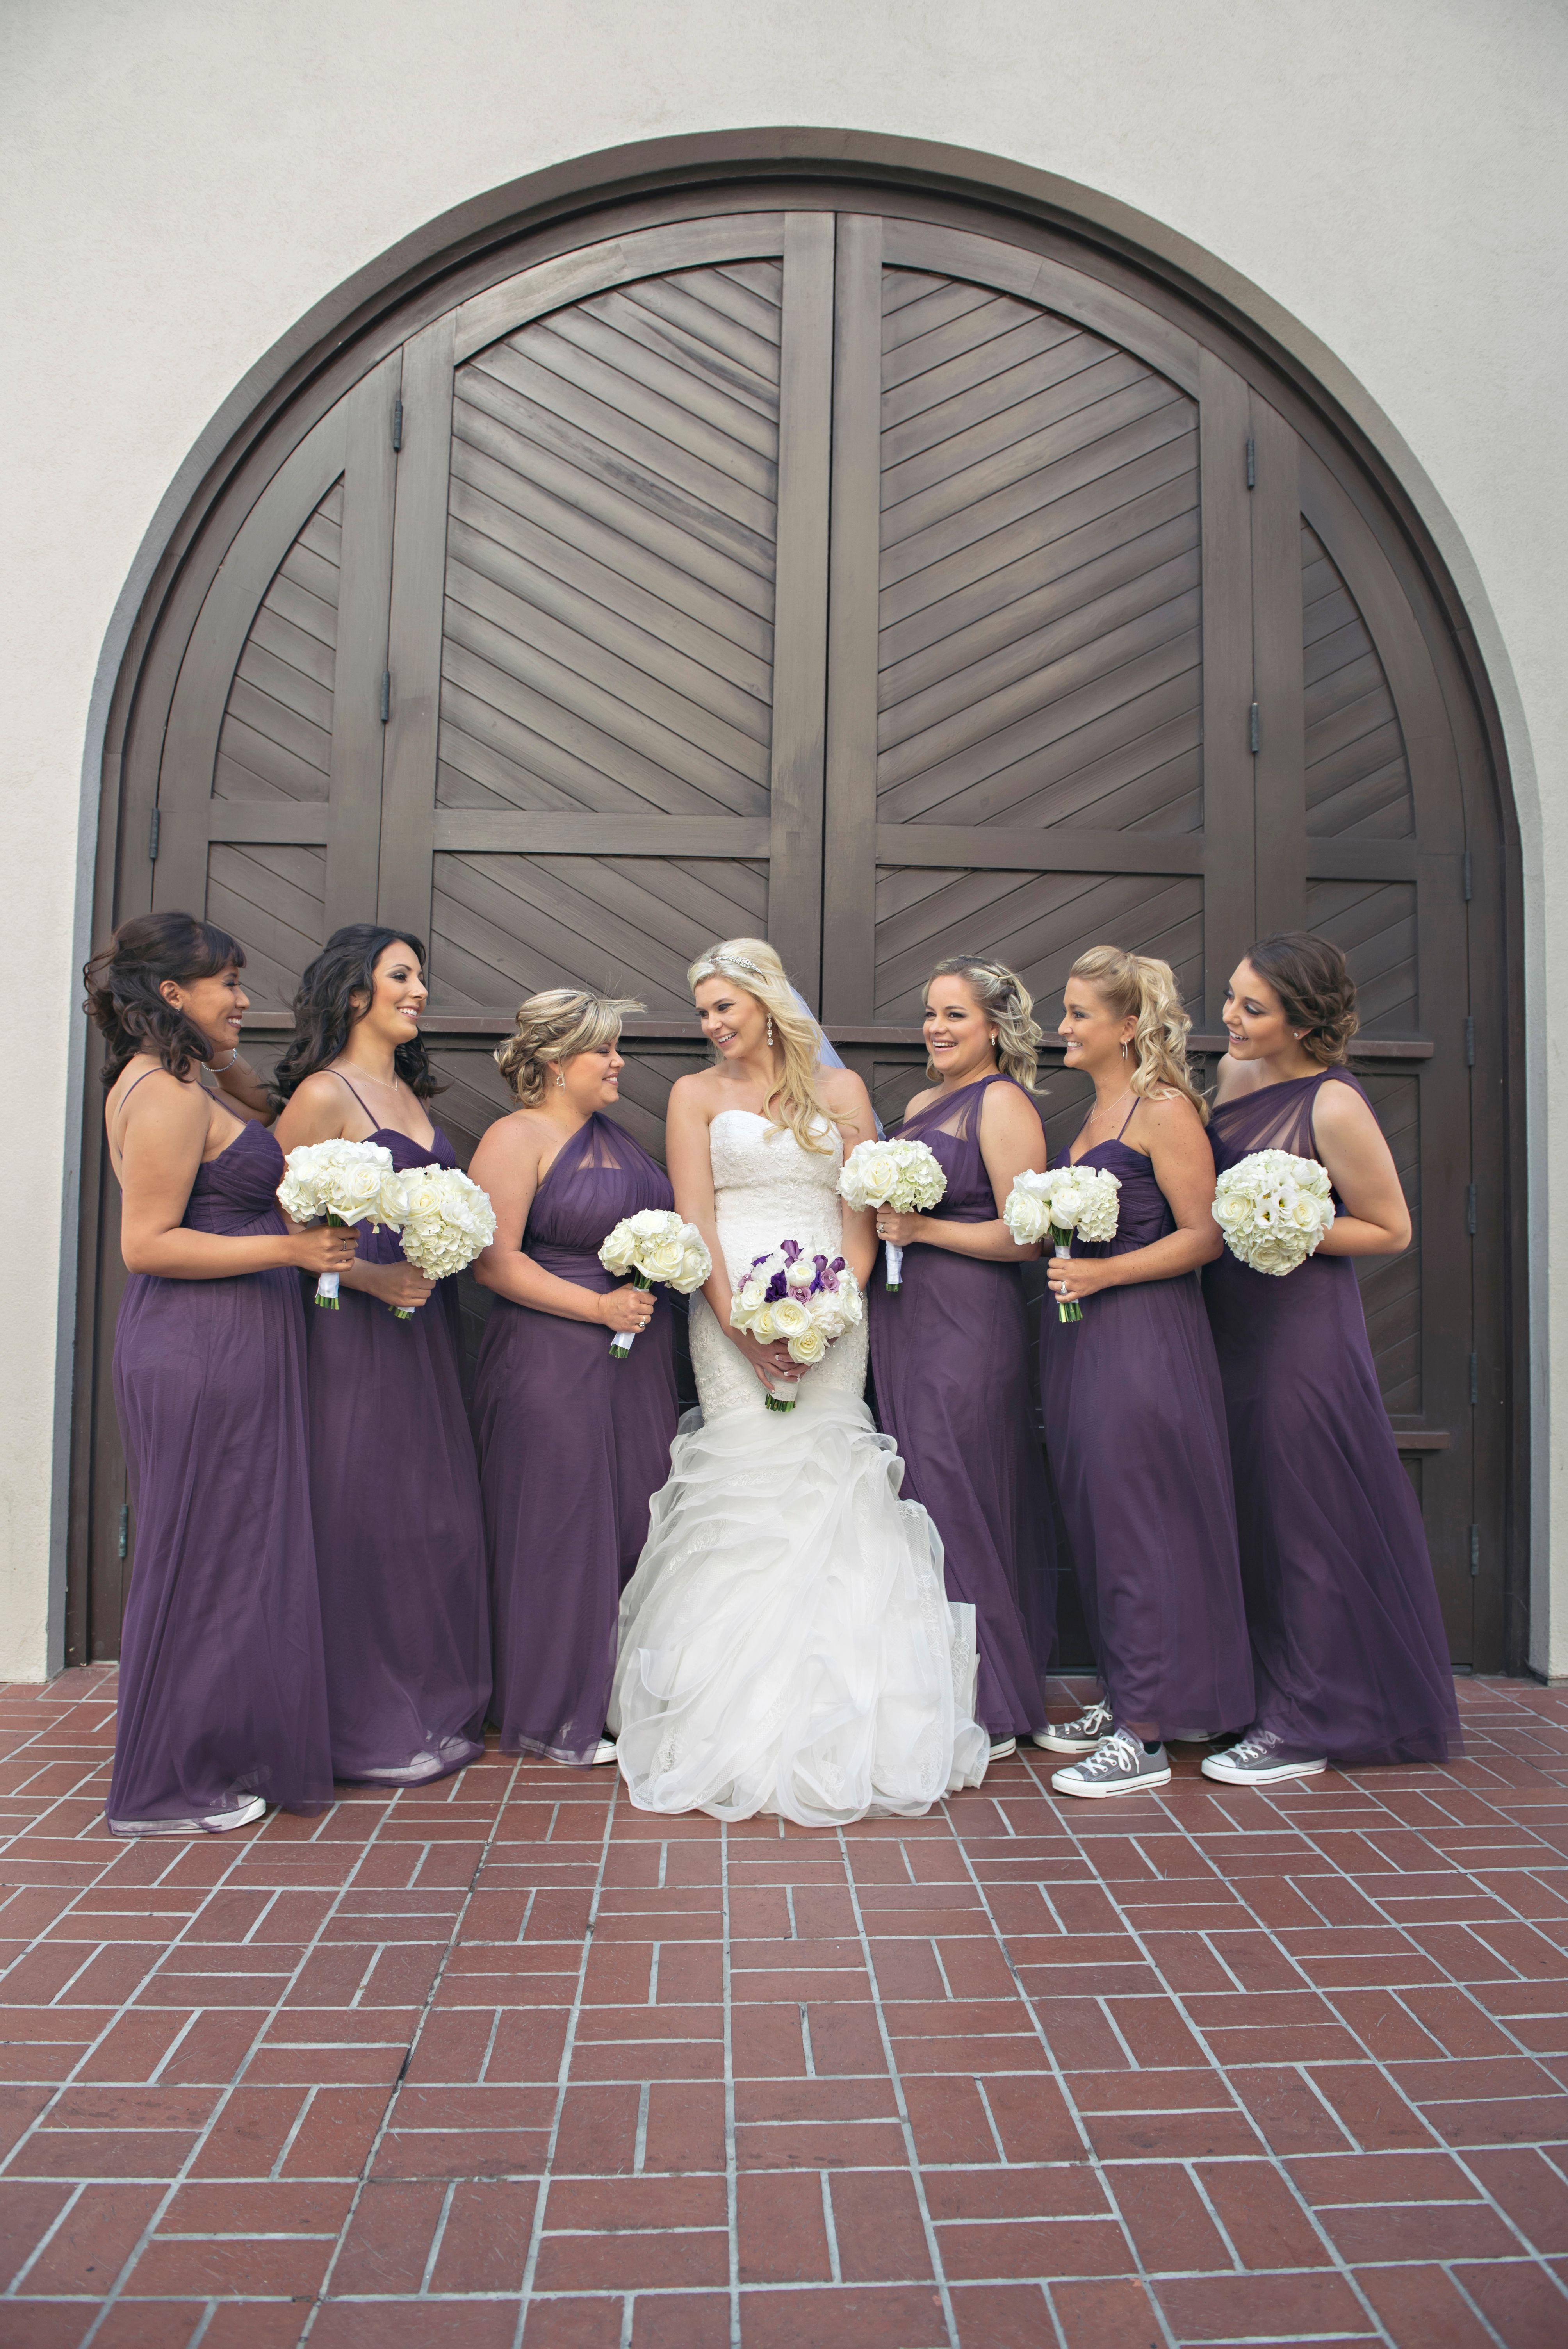 wedding shoes bridesmaid photo - 1